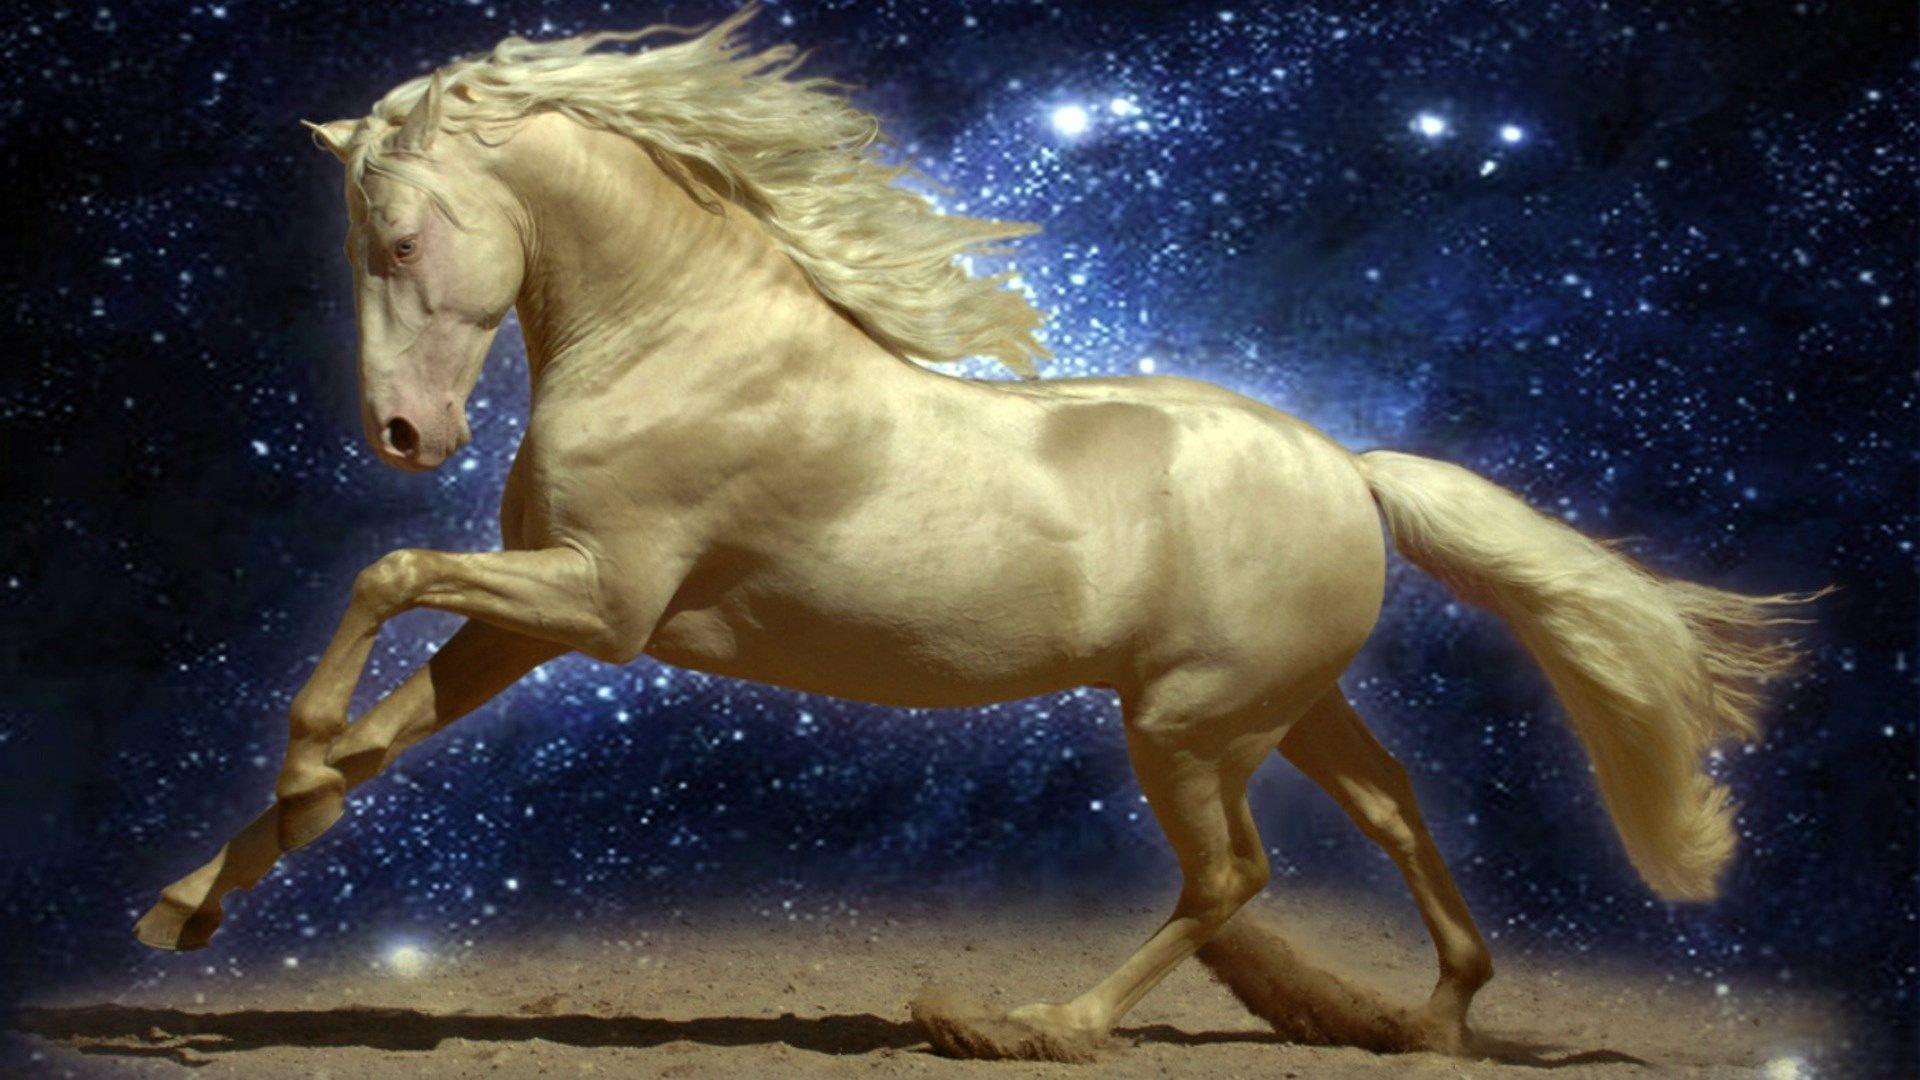 1920x1080 Horse Hd Widescreen Wallpapers For Laptop Jpg 291 Kb Horse Wallpaper Horses Albino Horse